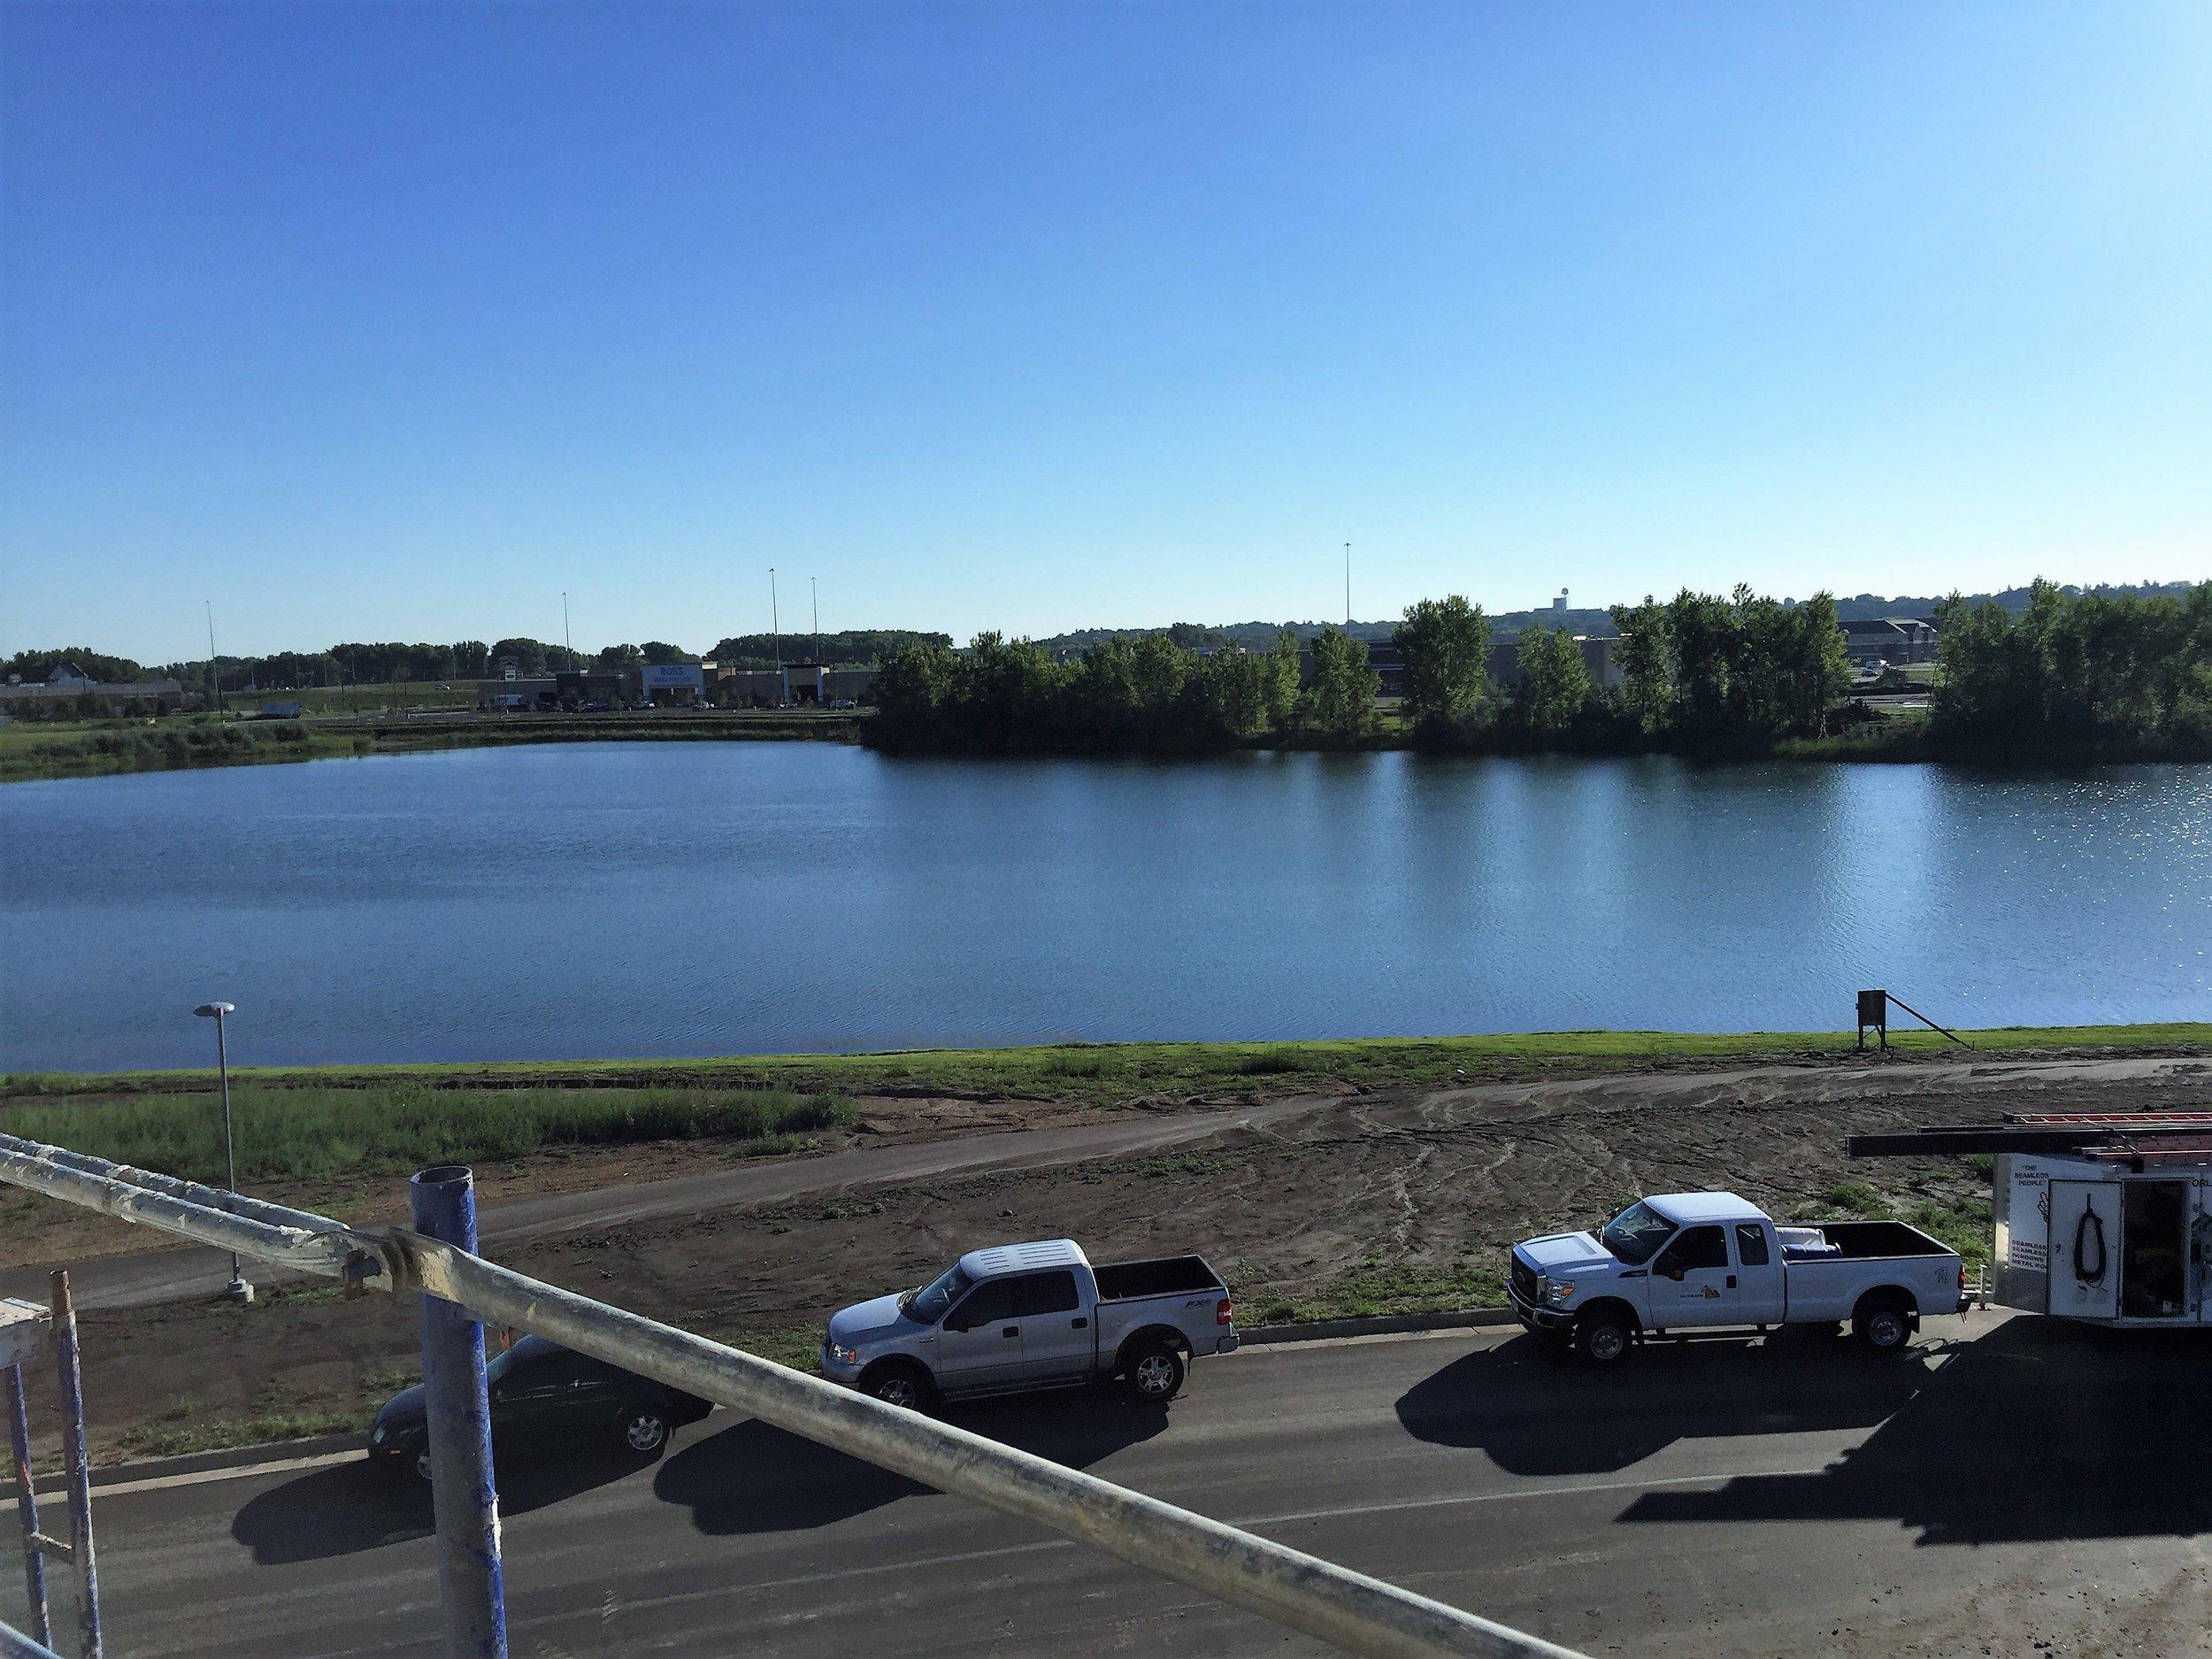 2017-08-22 Westlake View.JPG